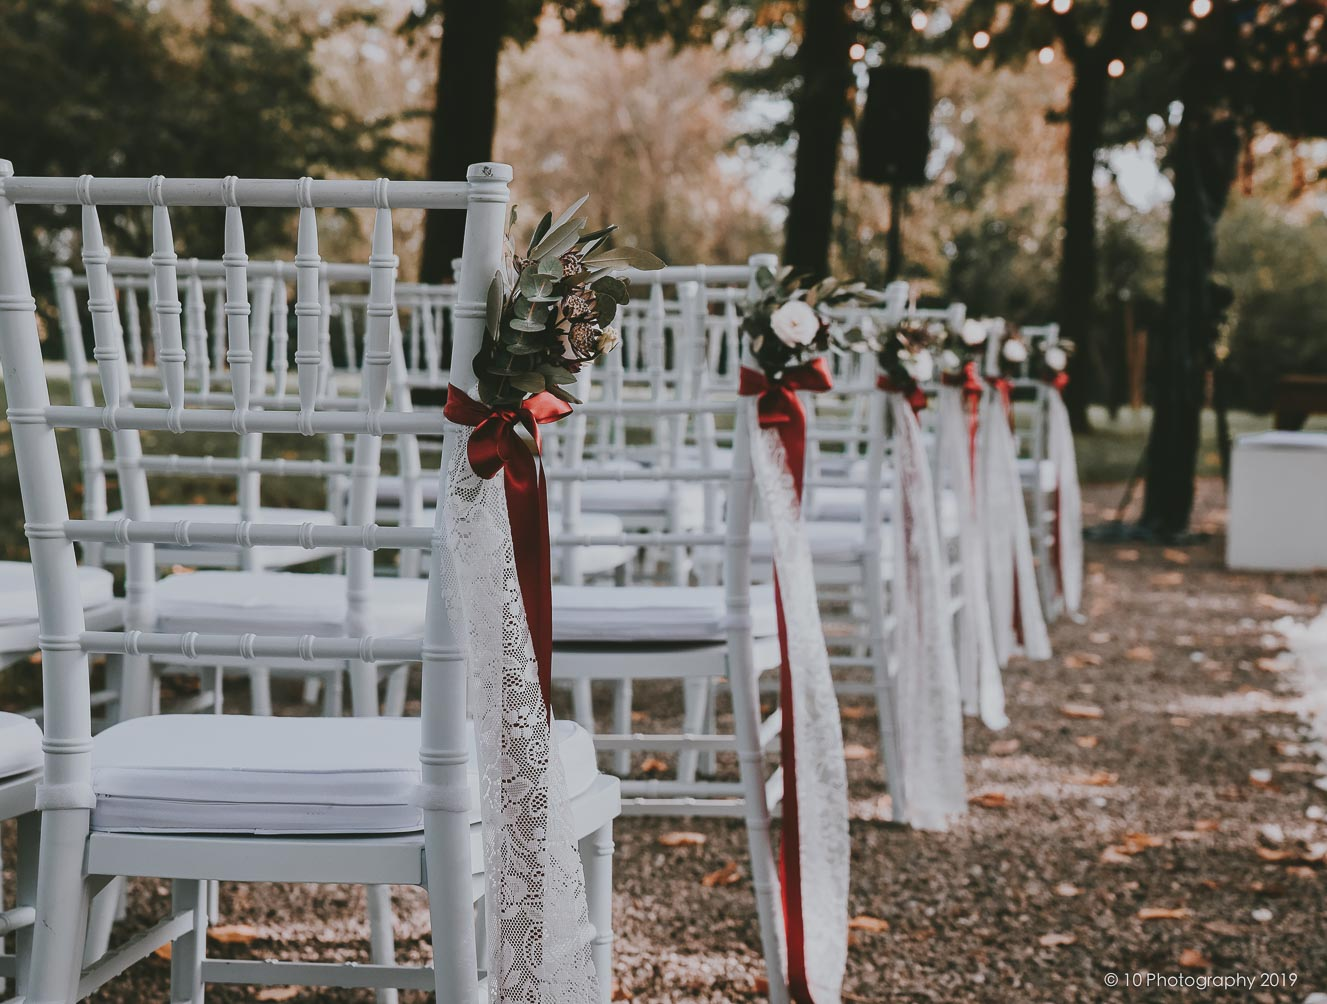 addobbi floreali matrimonio boho chic autunnale a Modena